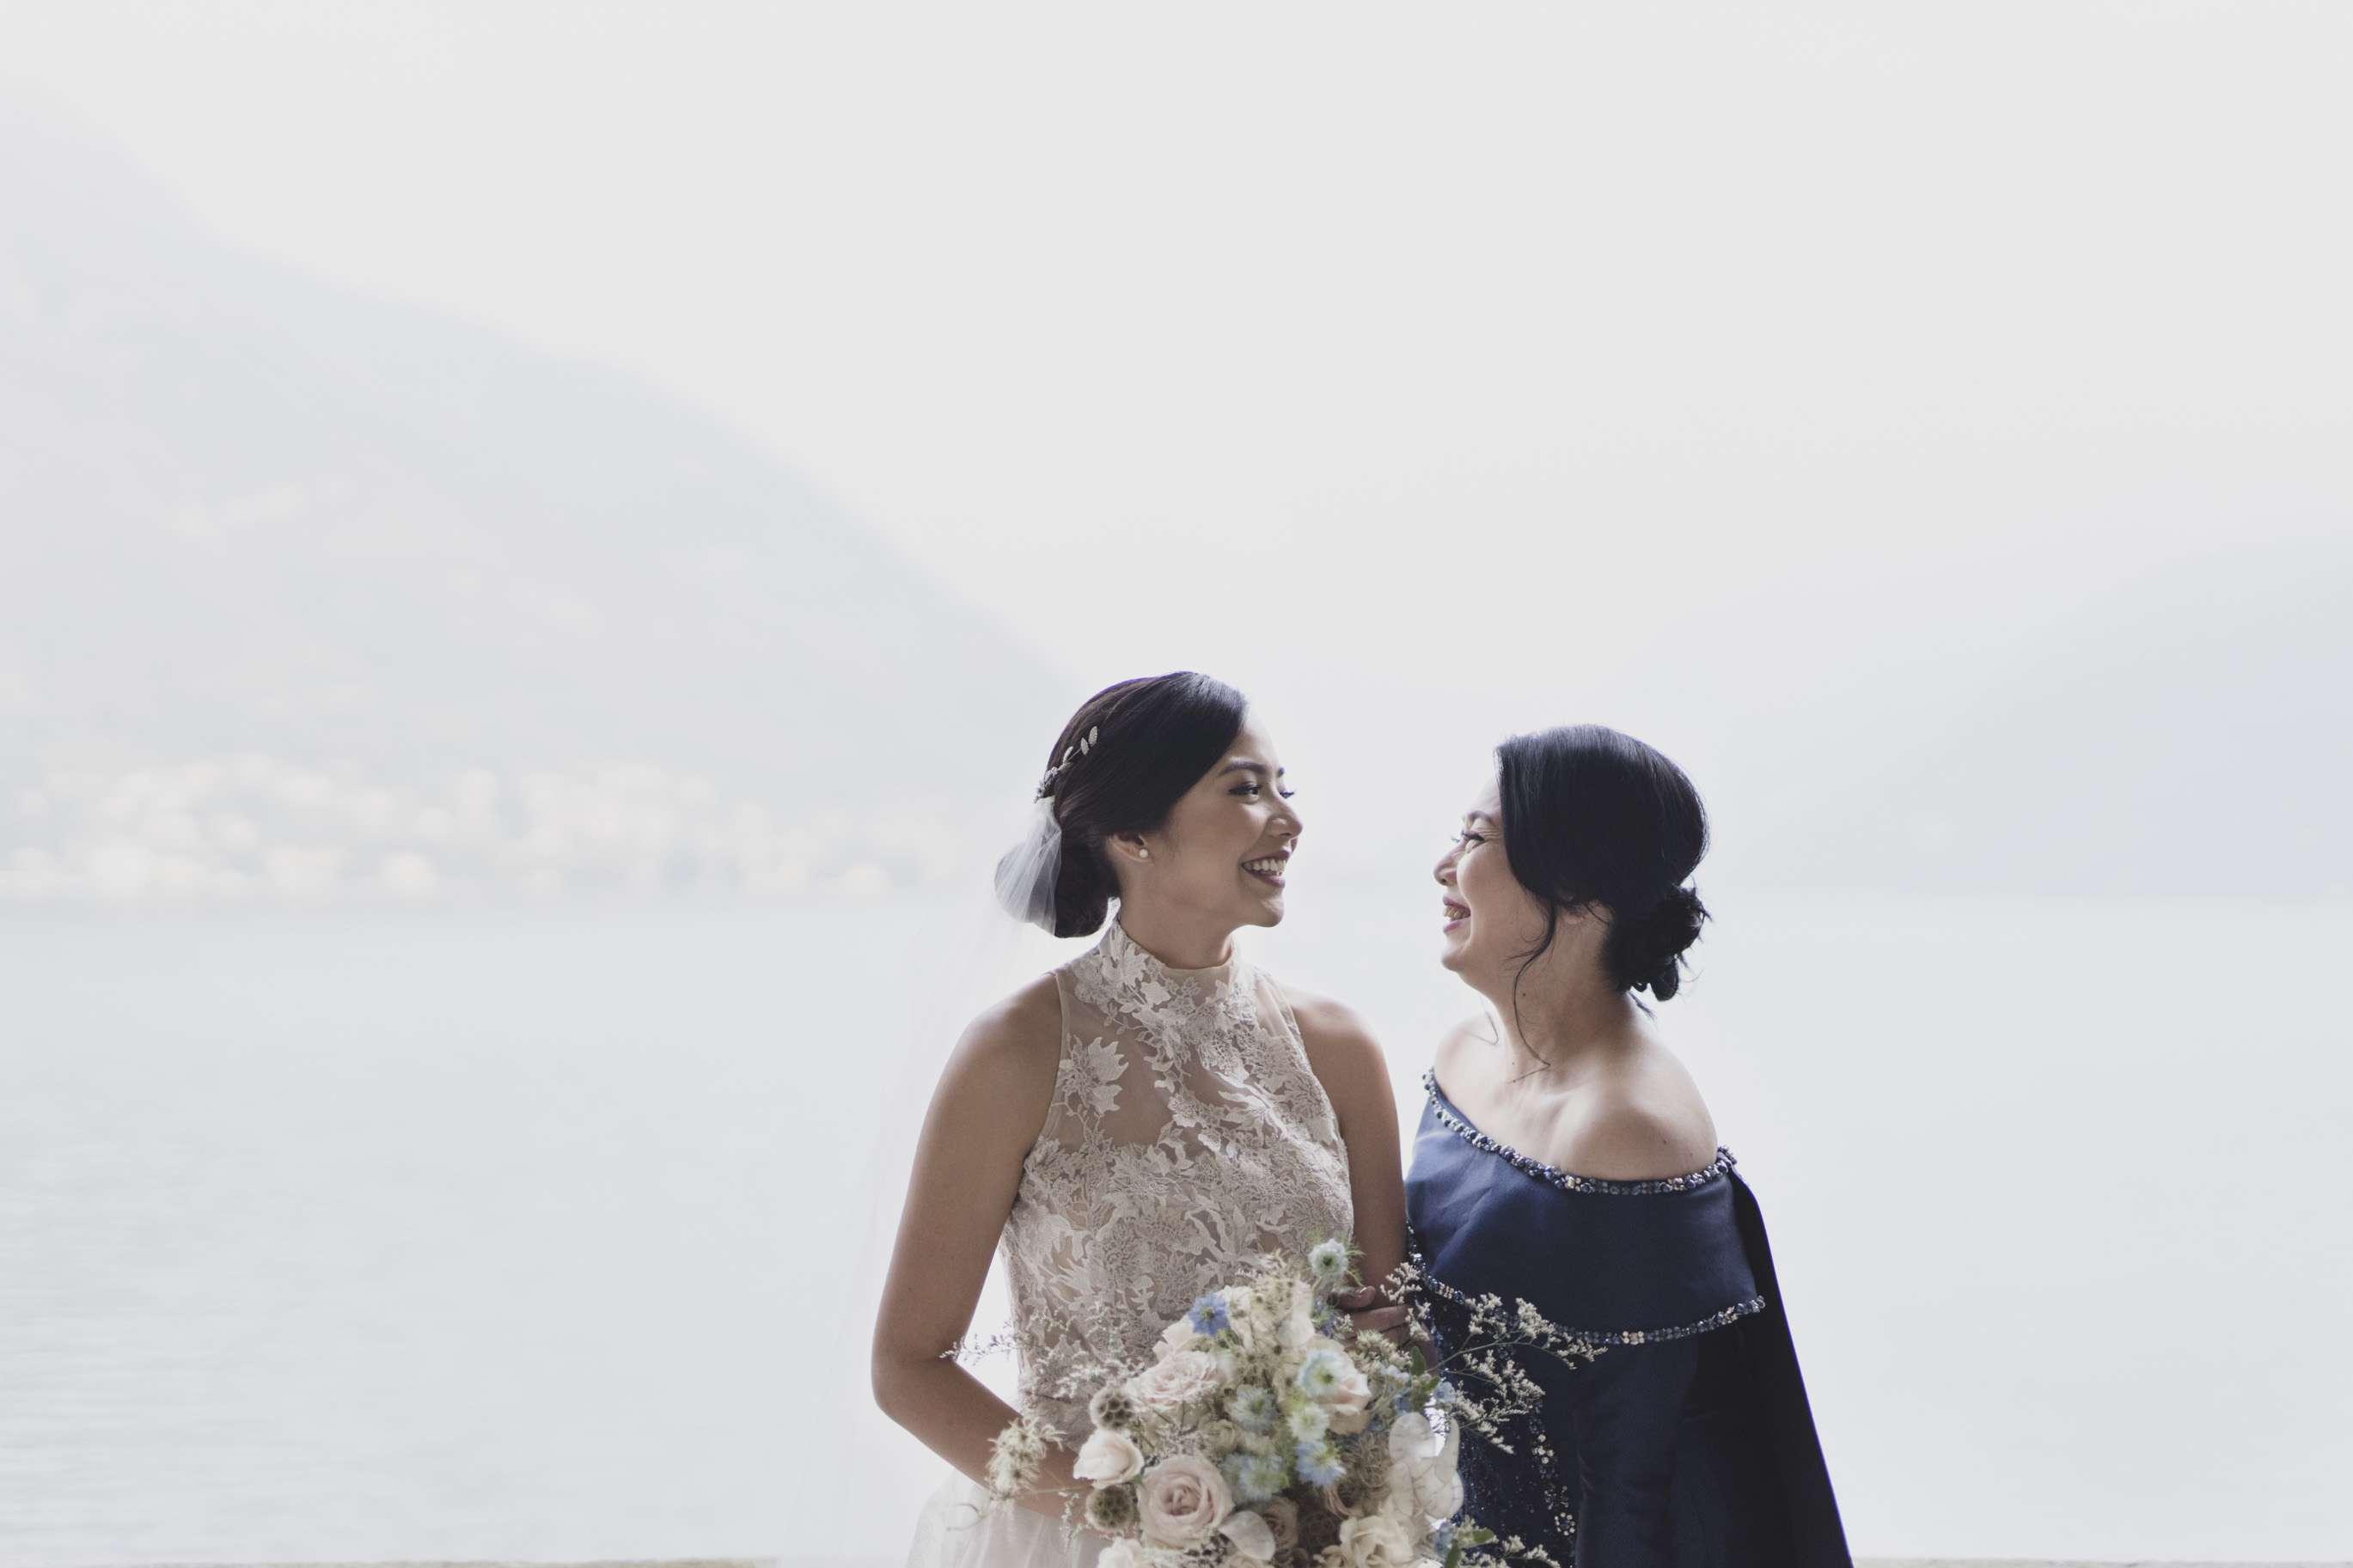 Mother daughter portrait in Lake Como